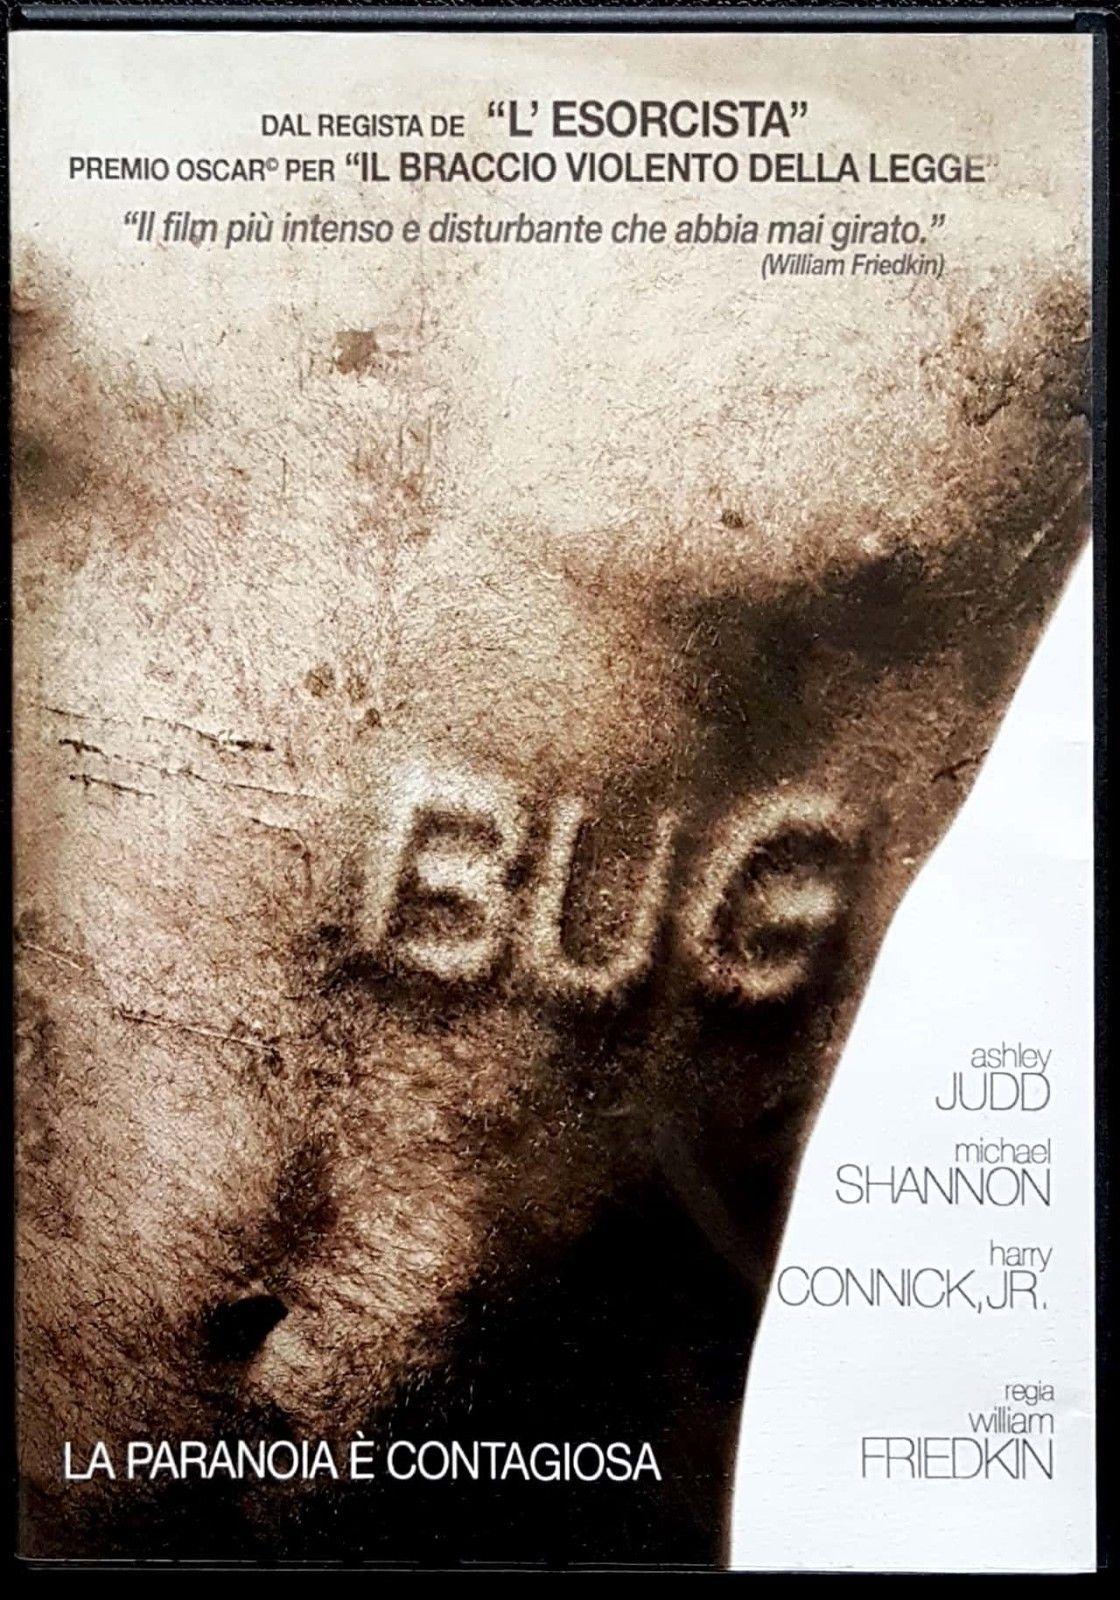 Ashley JUDD& William Friedkin: Bug (Incerto Cinema3)